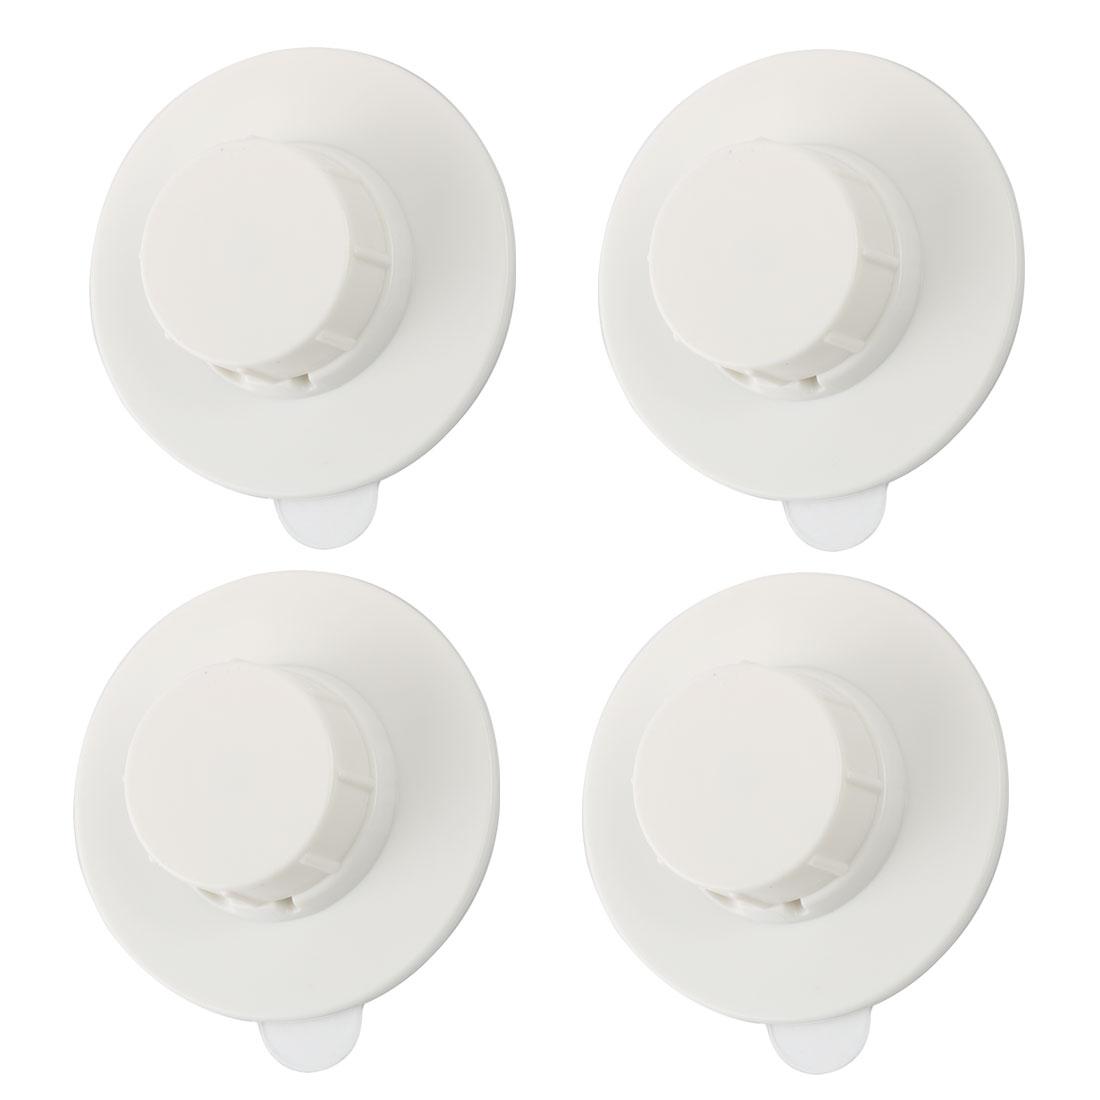 Meike Household Authorized Self Stick Wall Hook Bathroom Hanger 4pcs